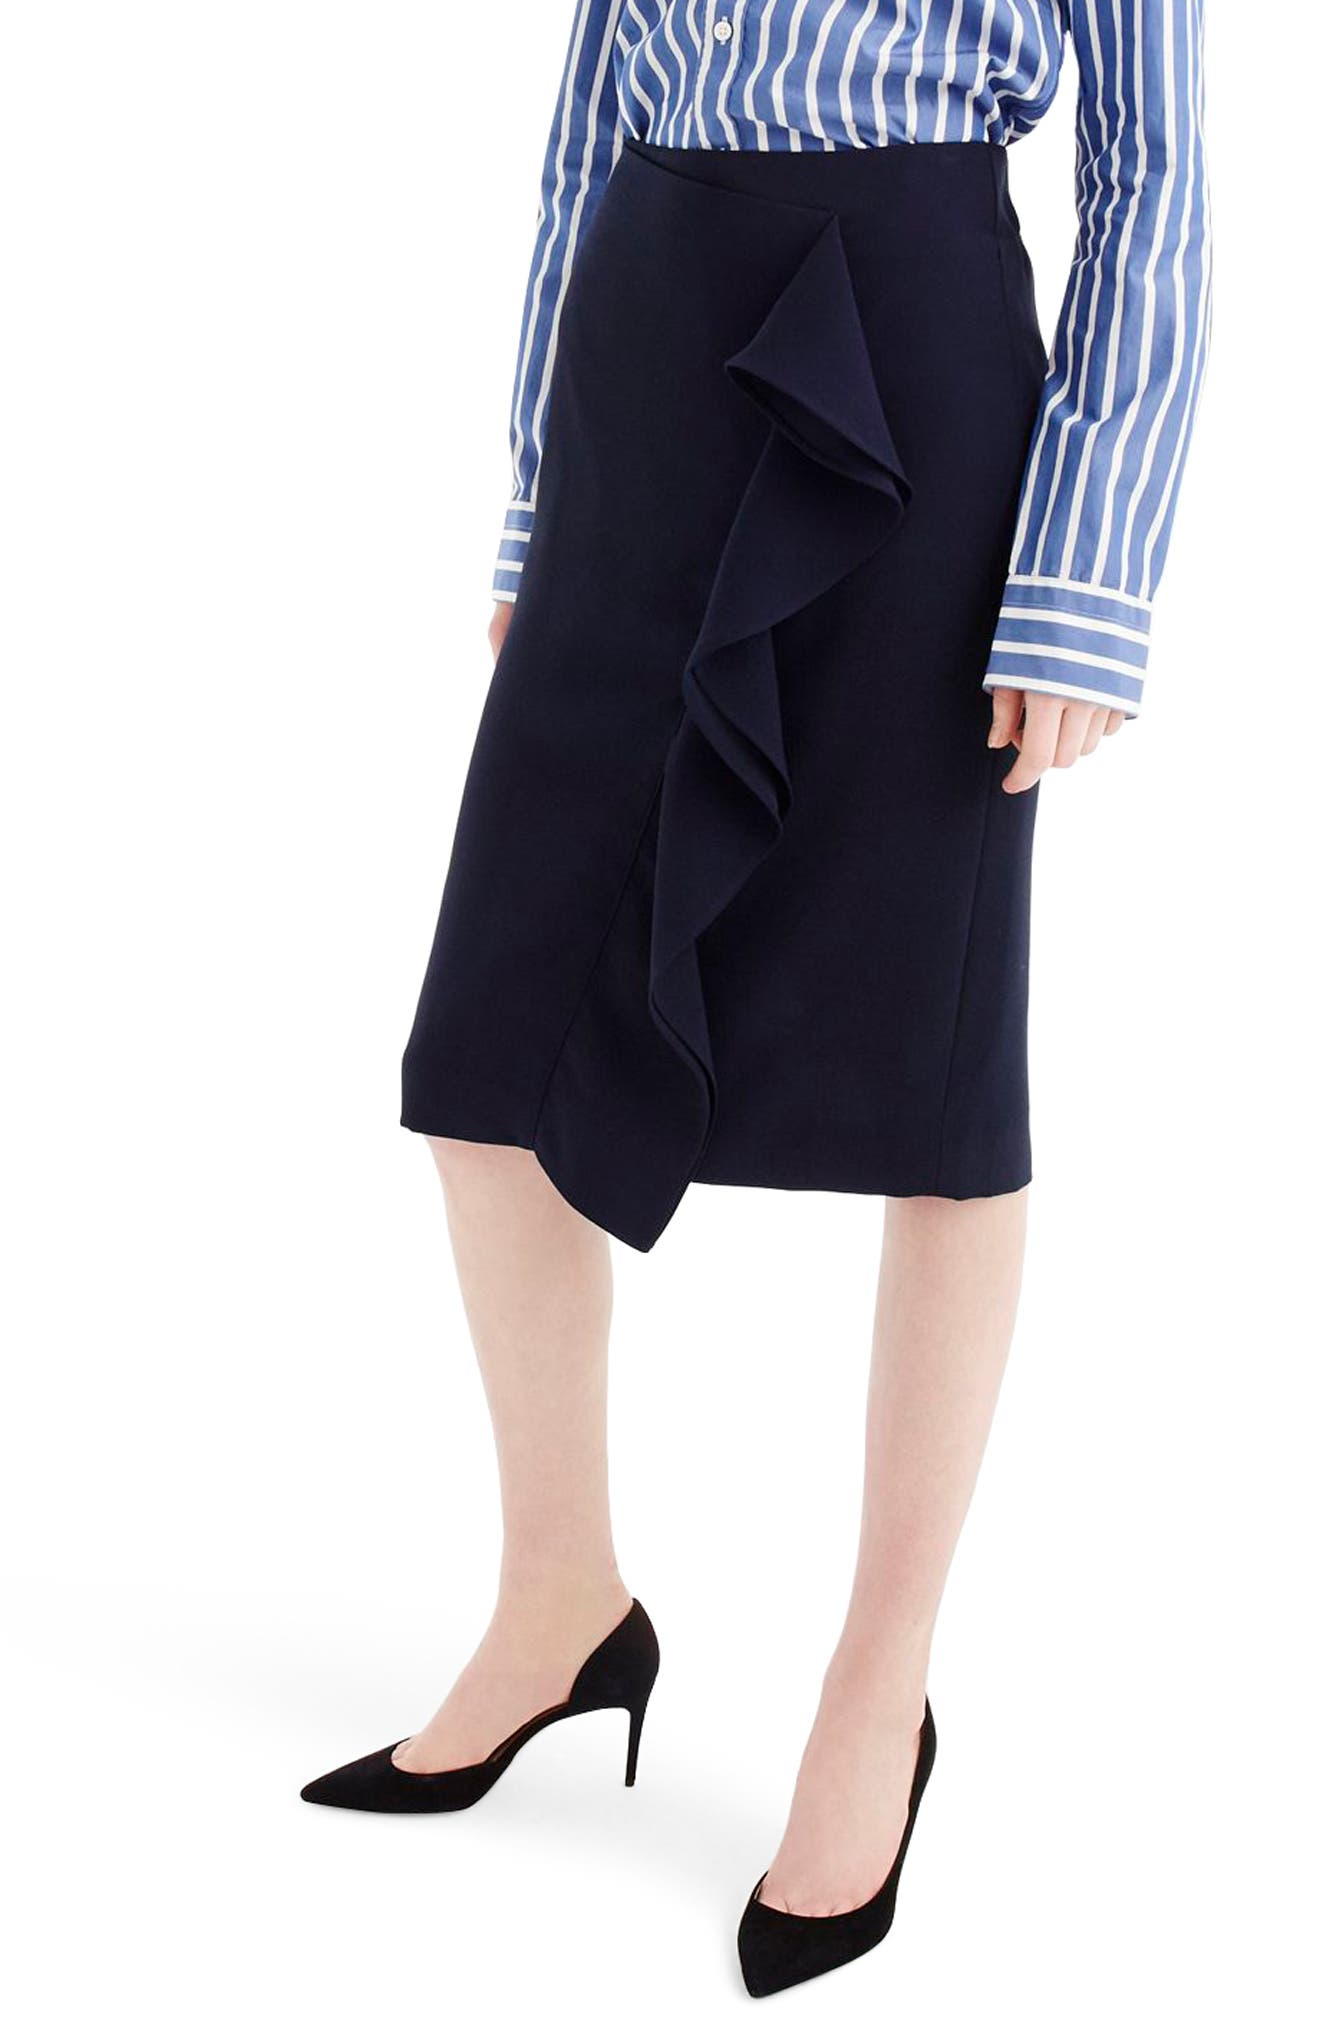 J.Crew 365 Crepe Ruffle Pencil Skirt,                             Main thumbnail 1, color,                             Navy